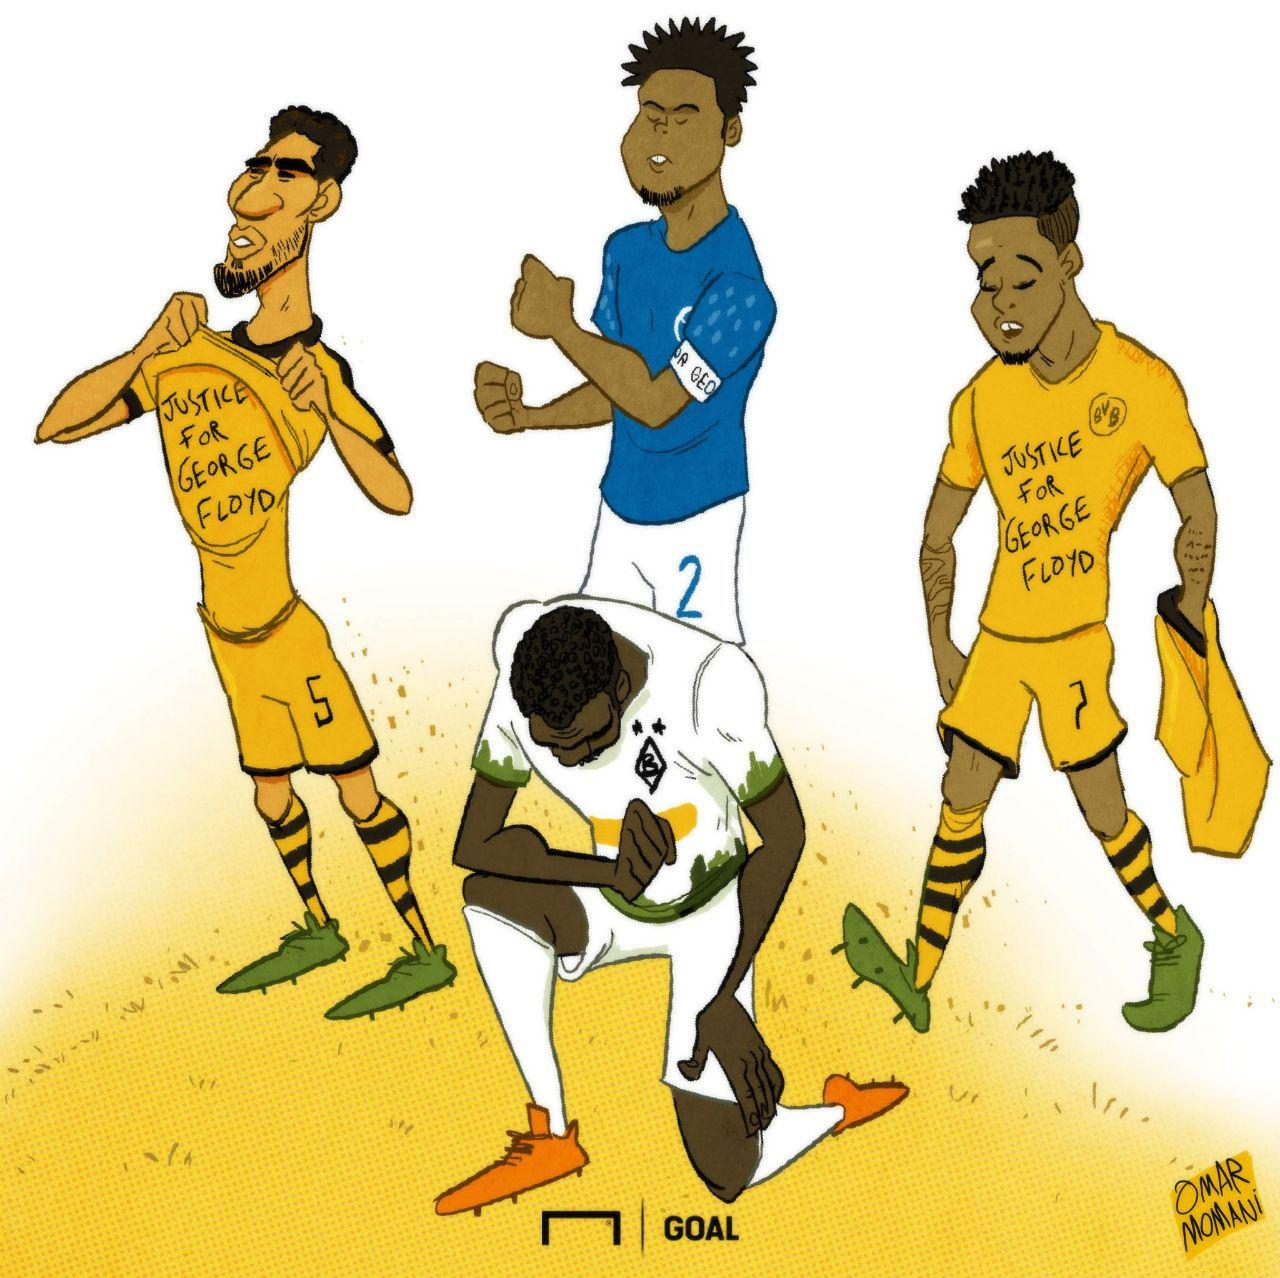 کارتون| زانوی فوتبالیستها روی گلوی پلیس آمریکا